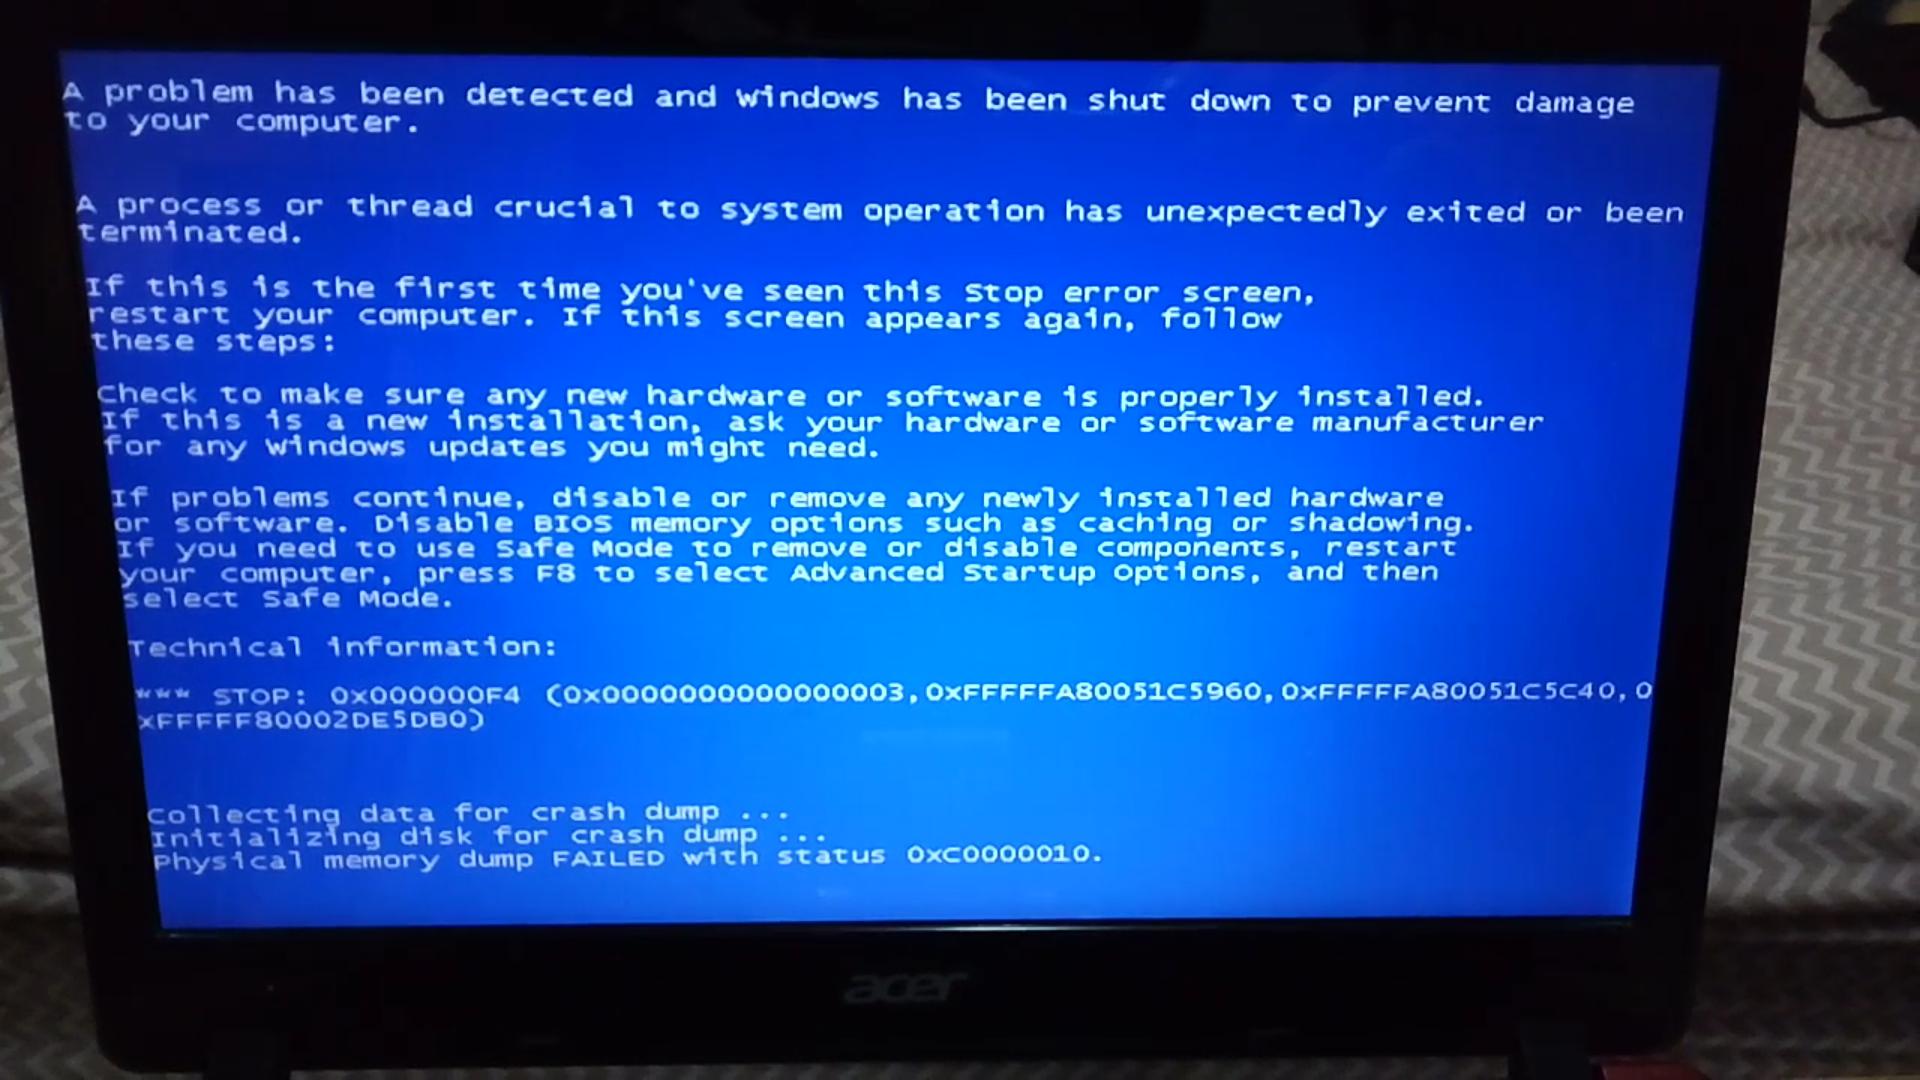 schermo blu, problemi al disco, recupero dati hard disk schermo blu